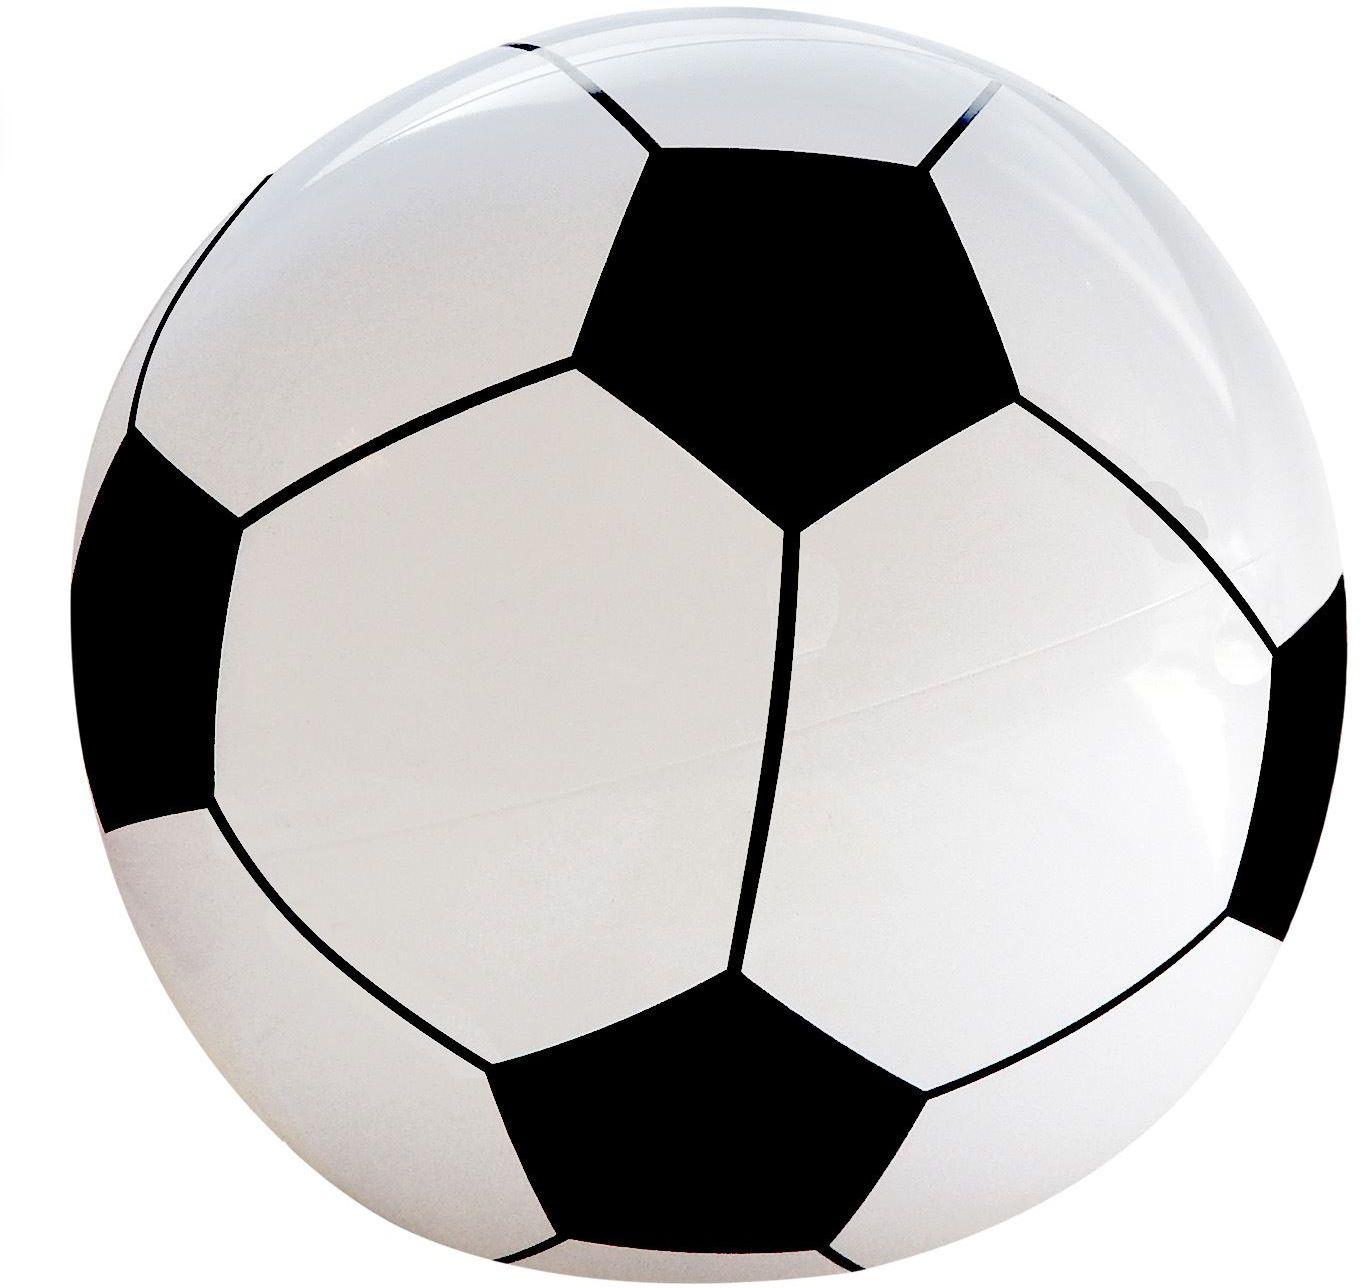 Zwart witte opblaasbare voetbal